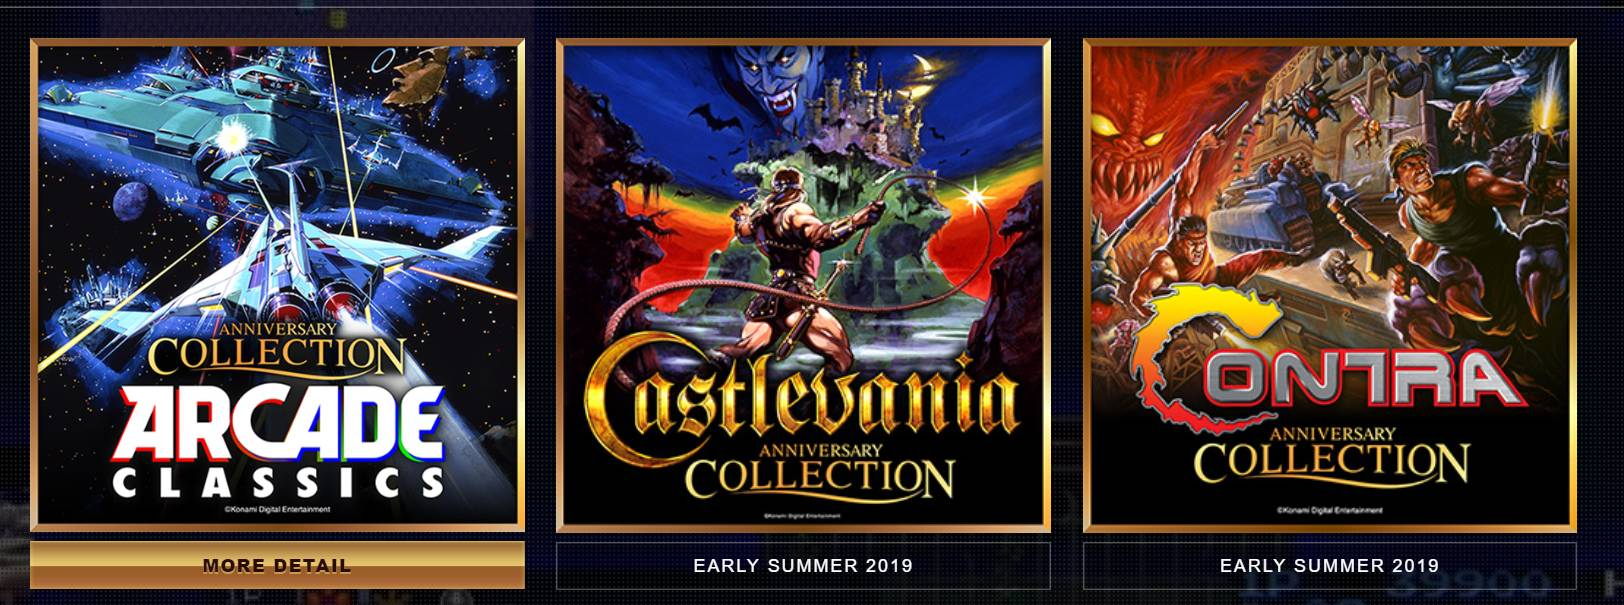 Konami Anniversary Collection, Arcade Classics, Castlevania Anniversary Collection, Contra Anniversary Collection